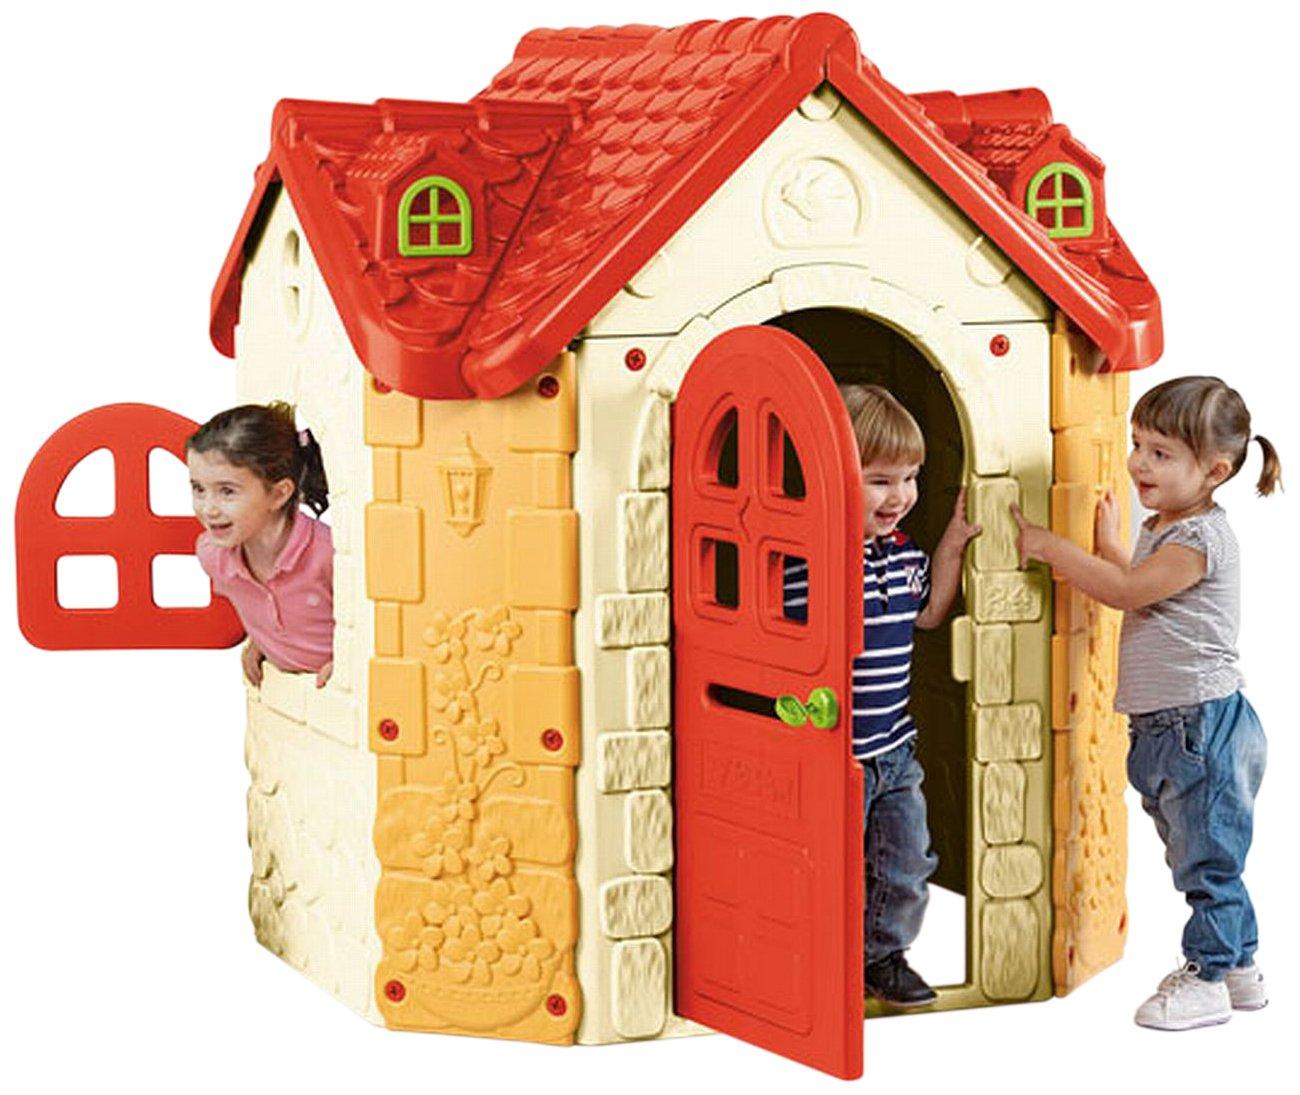 Feber 800008573 – Fancy Haus jetzt bestellen